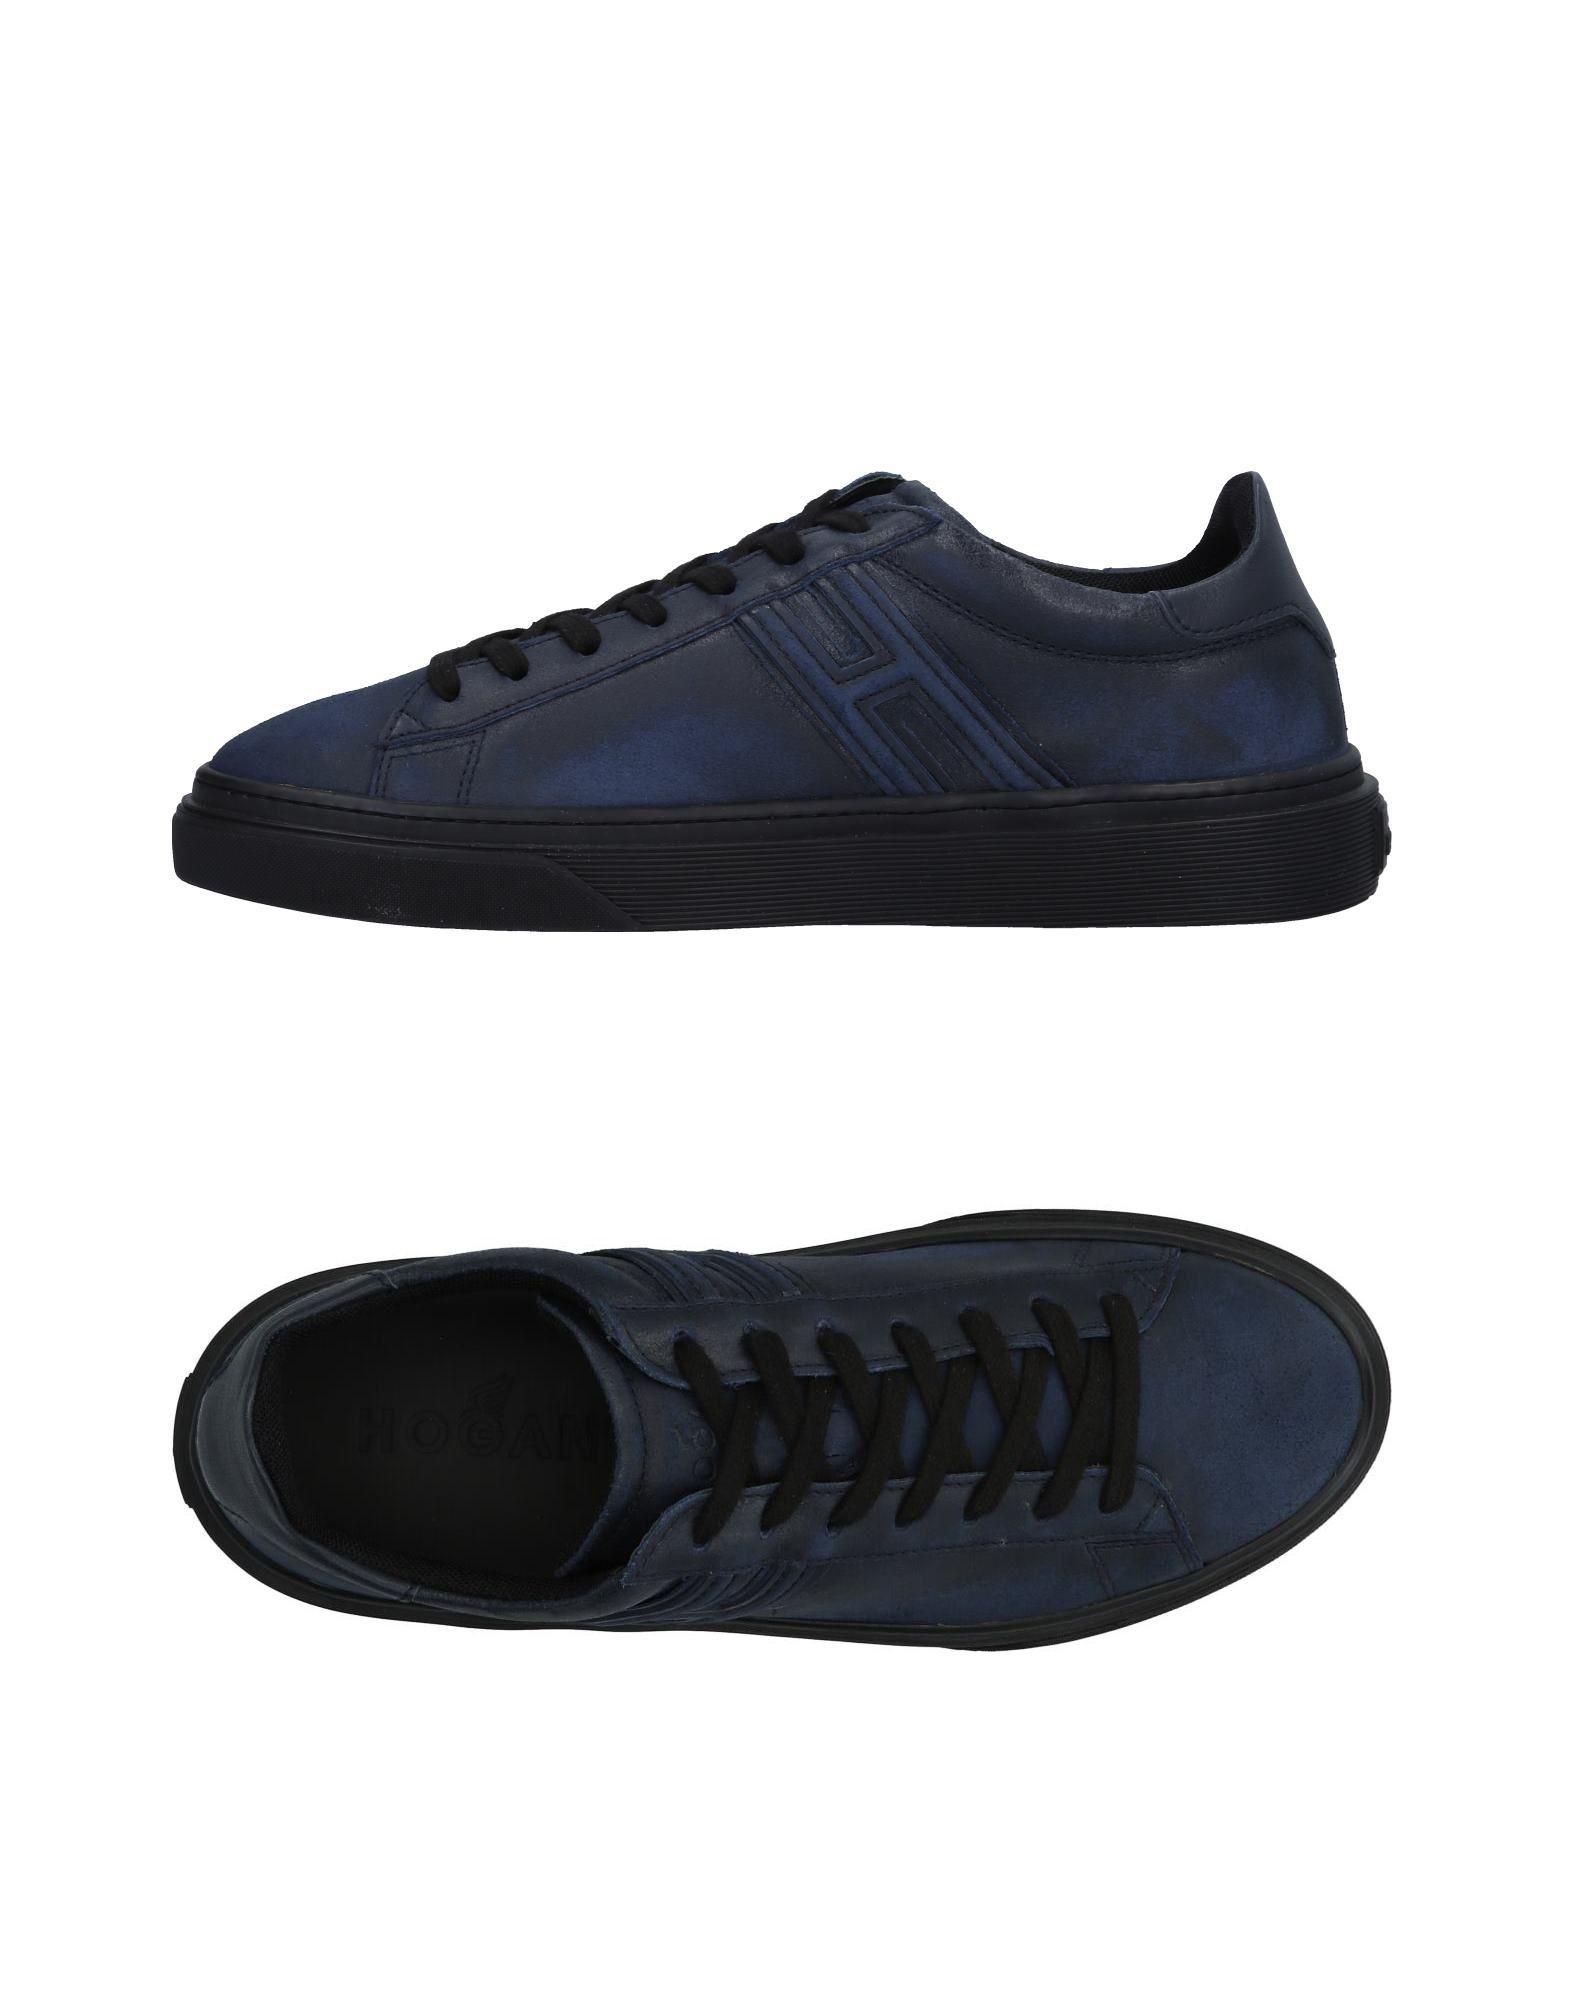 Moda Sneakers Hogan Uomo - - Uomo 11495421VQ 55e9b2